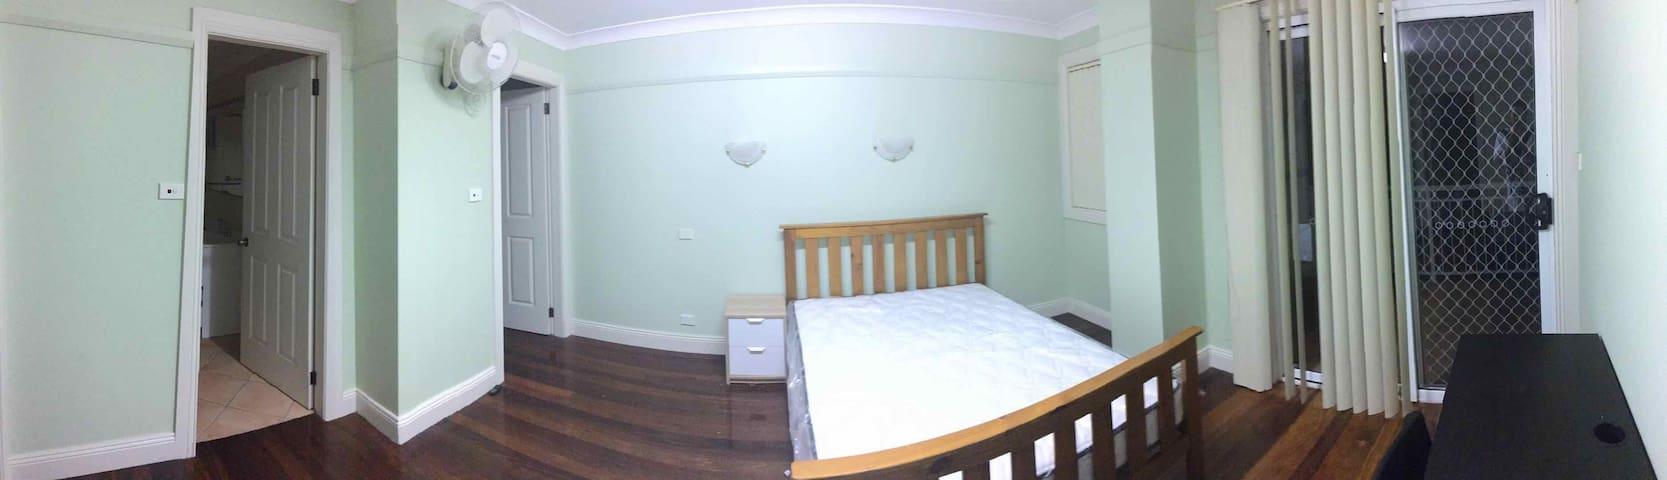 Cozy en suite at Kingsford